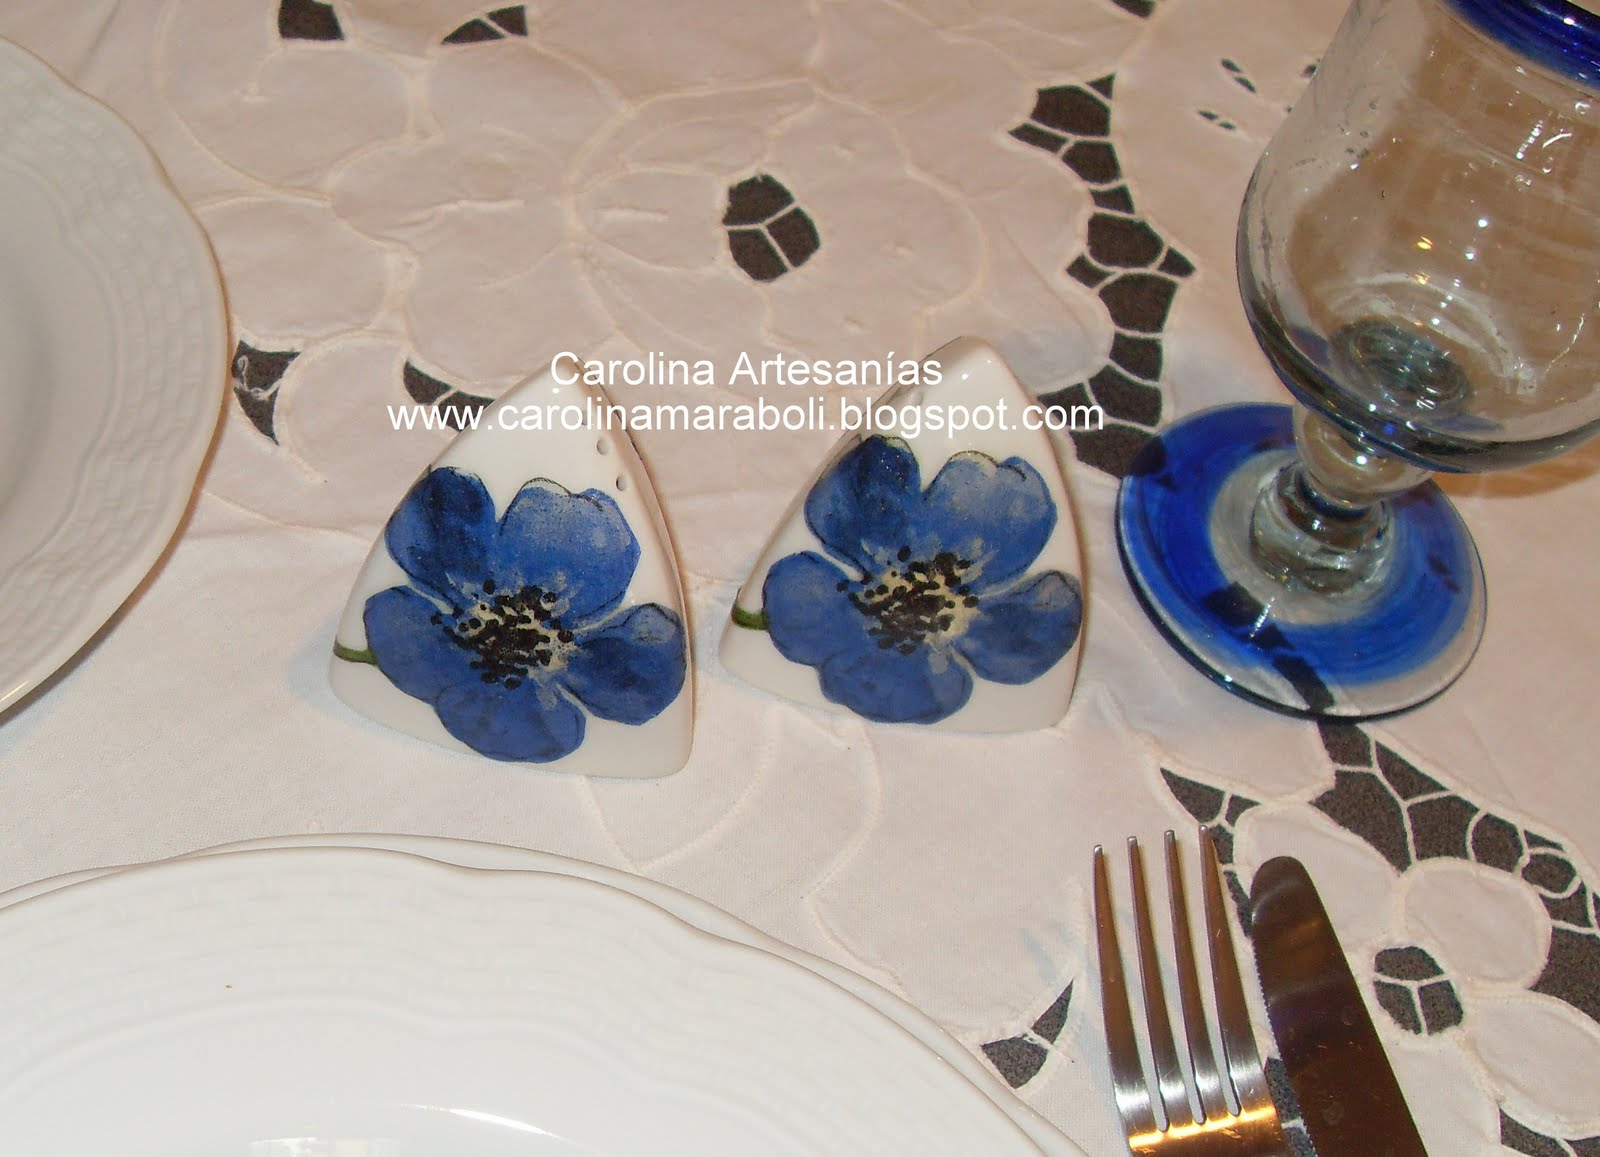 Vitrina de Carolina Artesanías (La Tienda): 12.- Salero, flor-azul